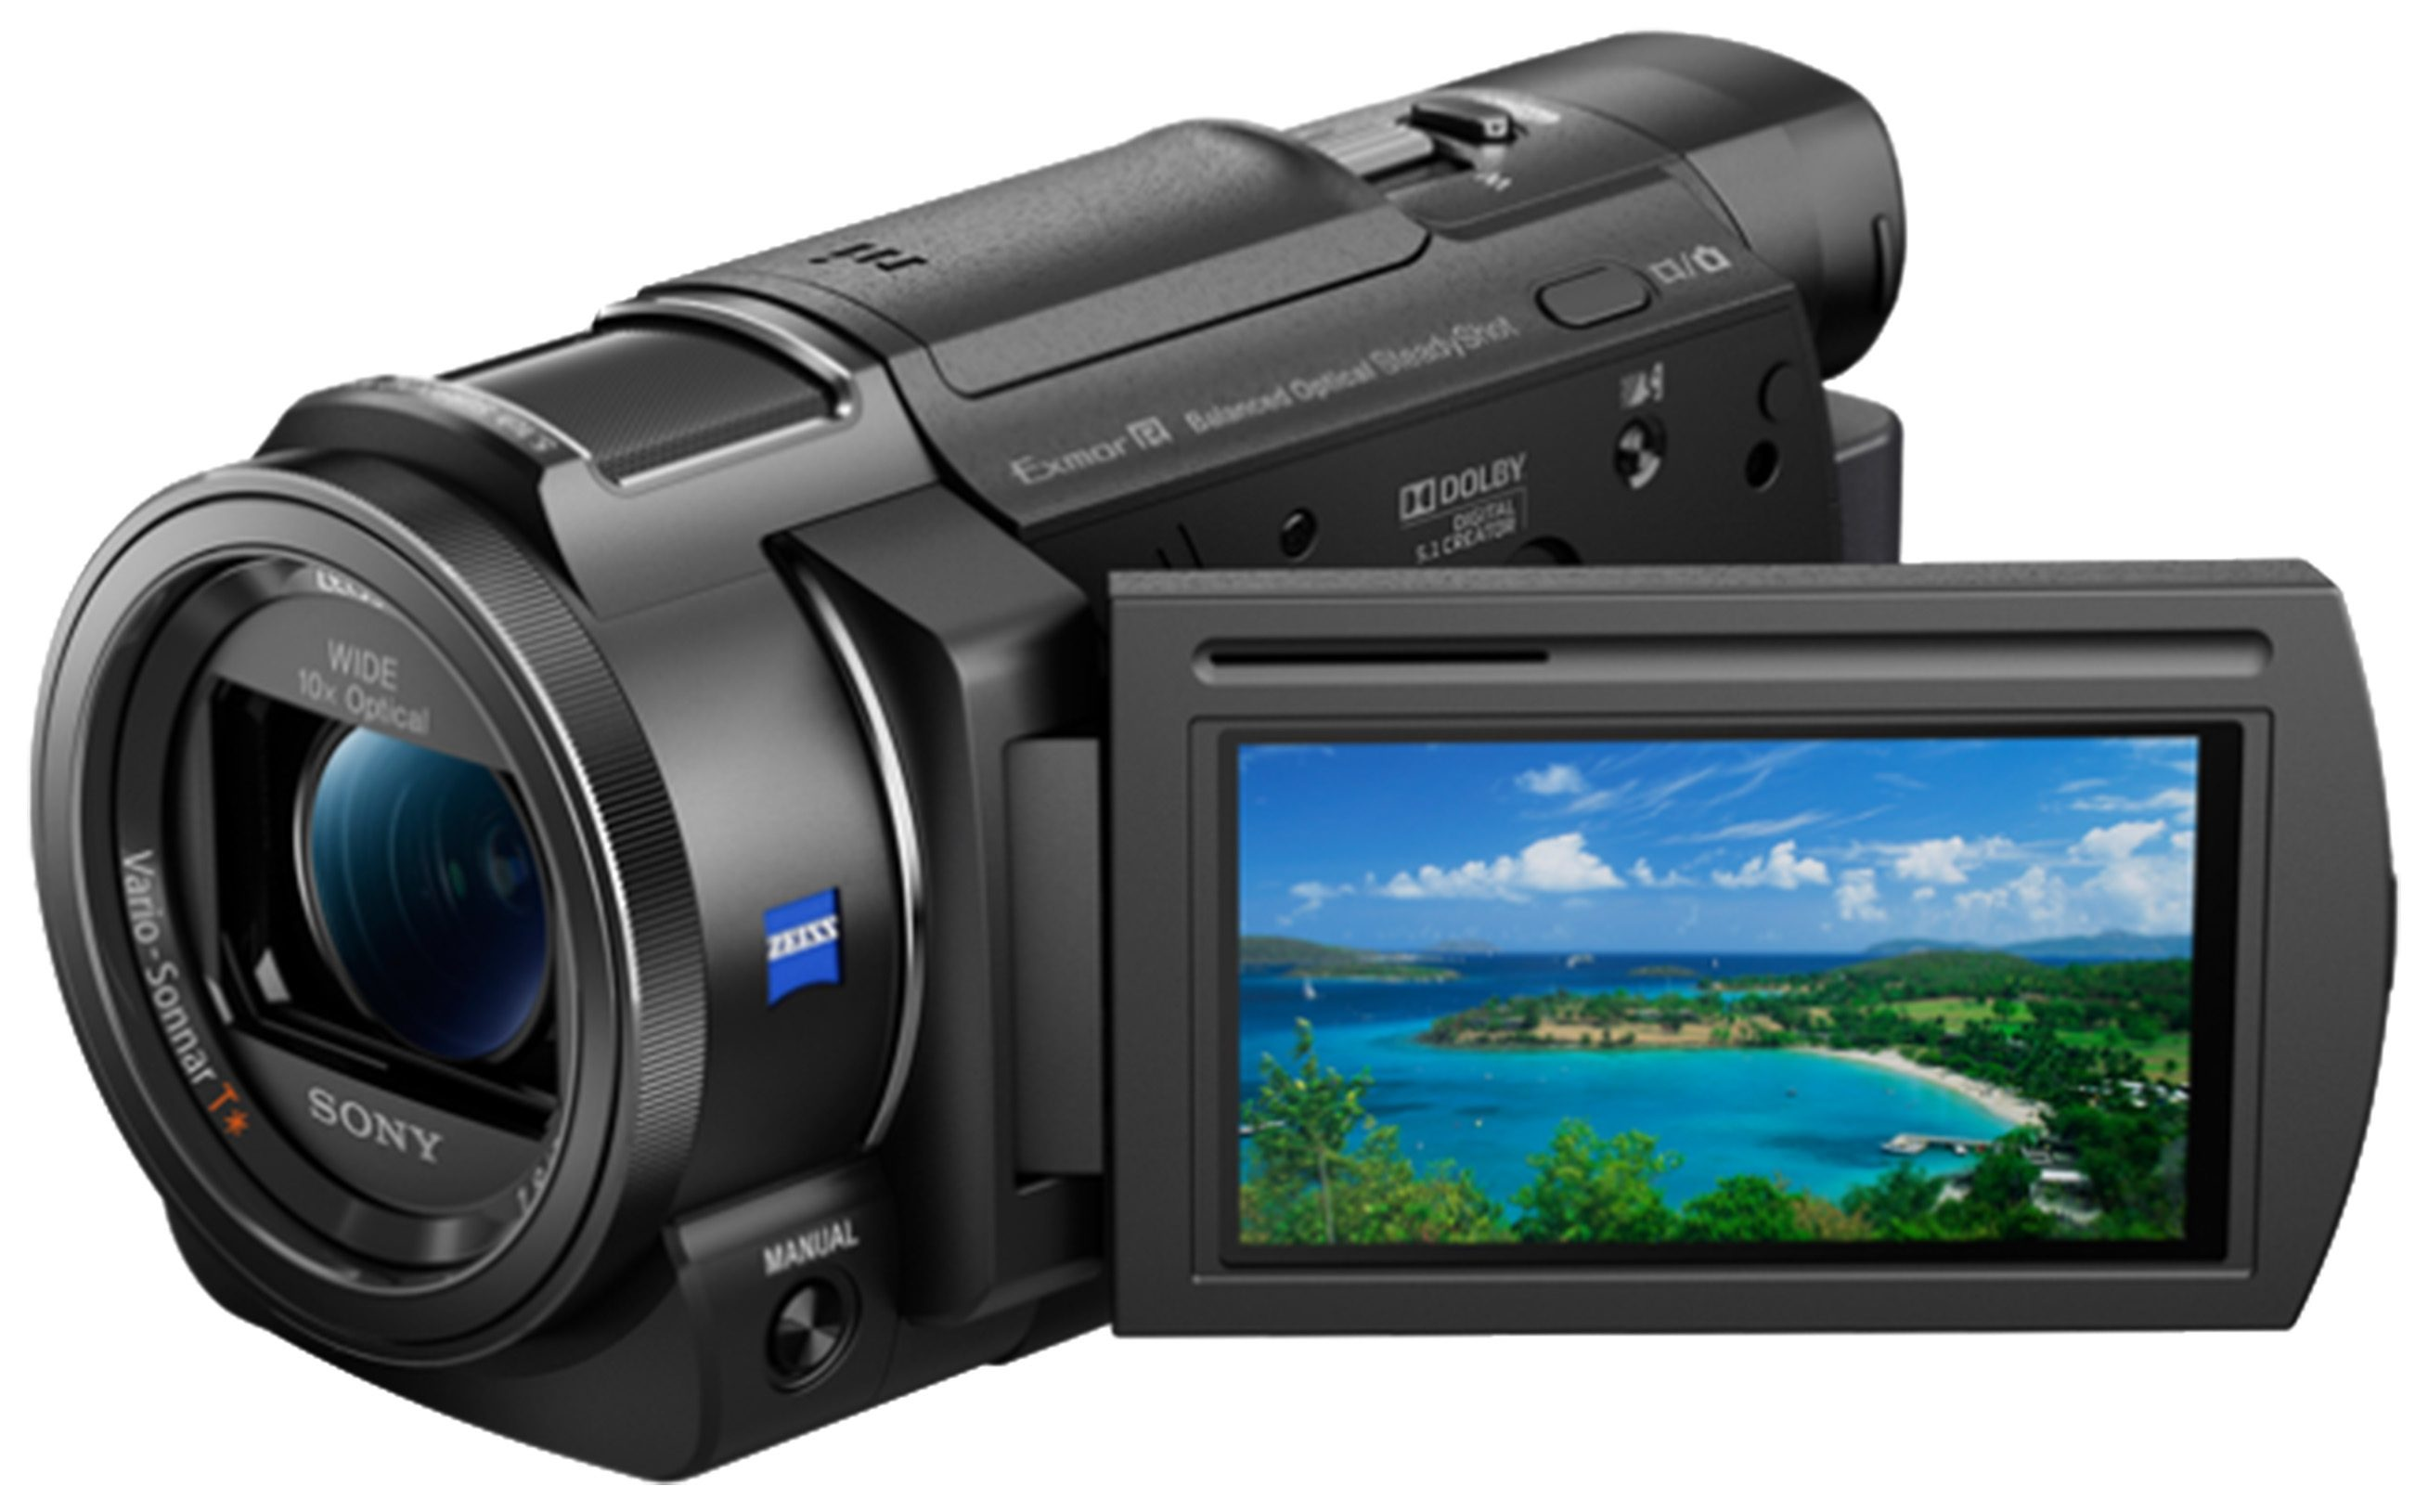 Sony FDR-AX33 Handycam 1080i (HD-ready) Camcorder, NFC